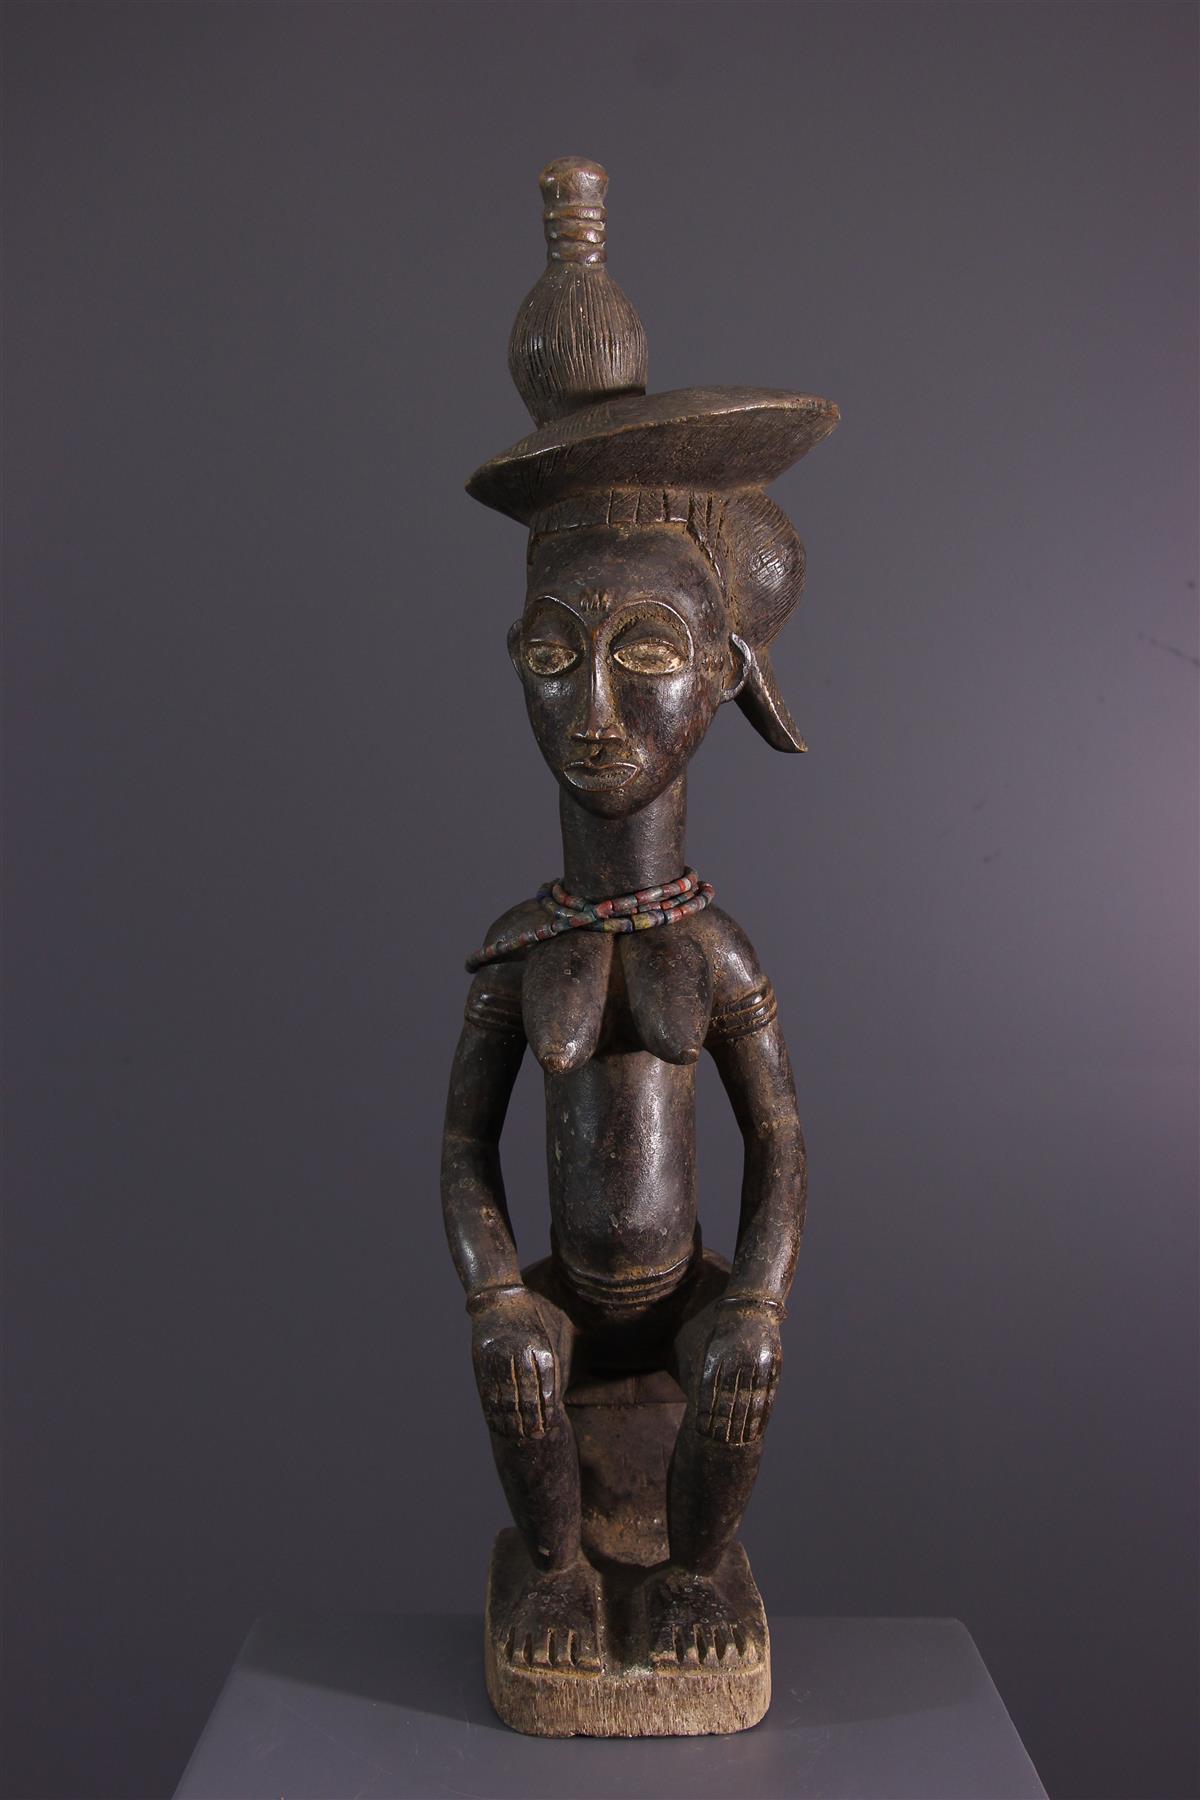 Statuette Baule - African art